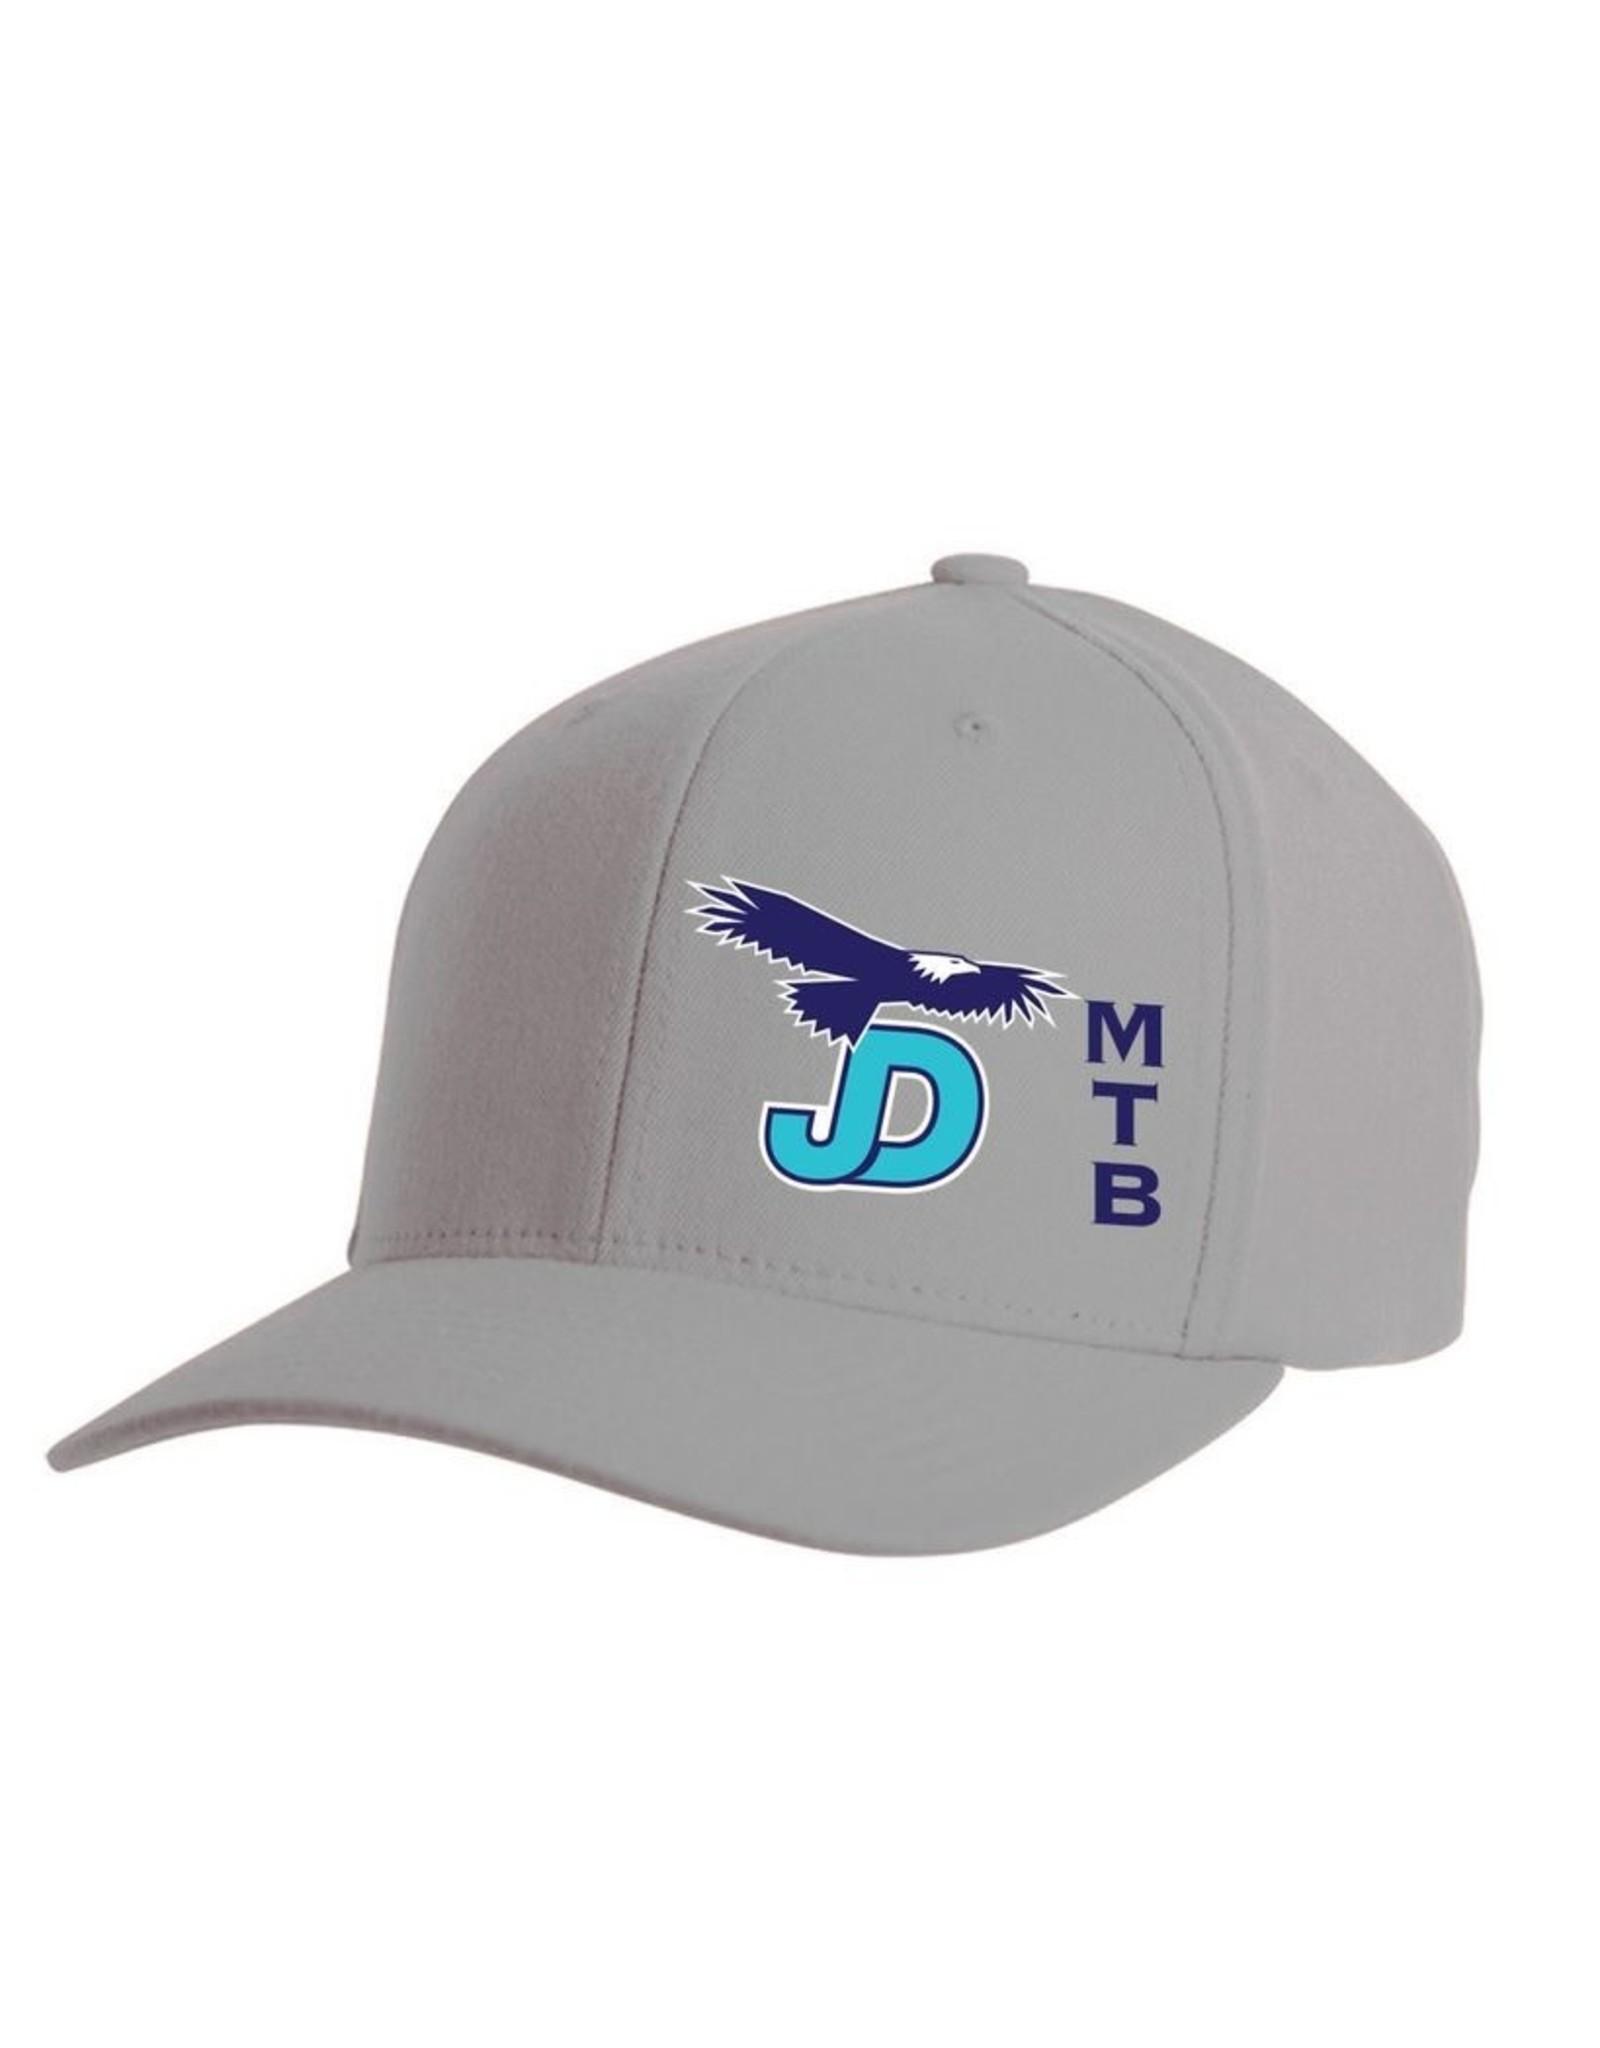 NON-UNIFORM Mountain Bike Team Hat